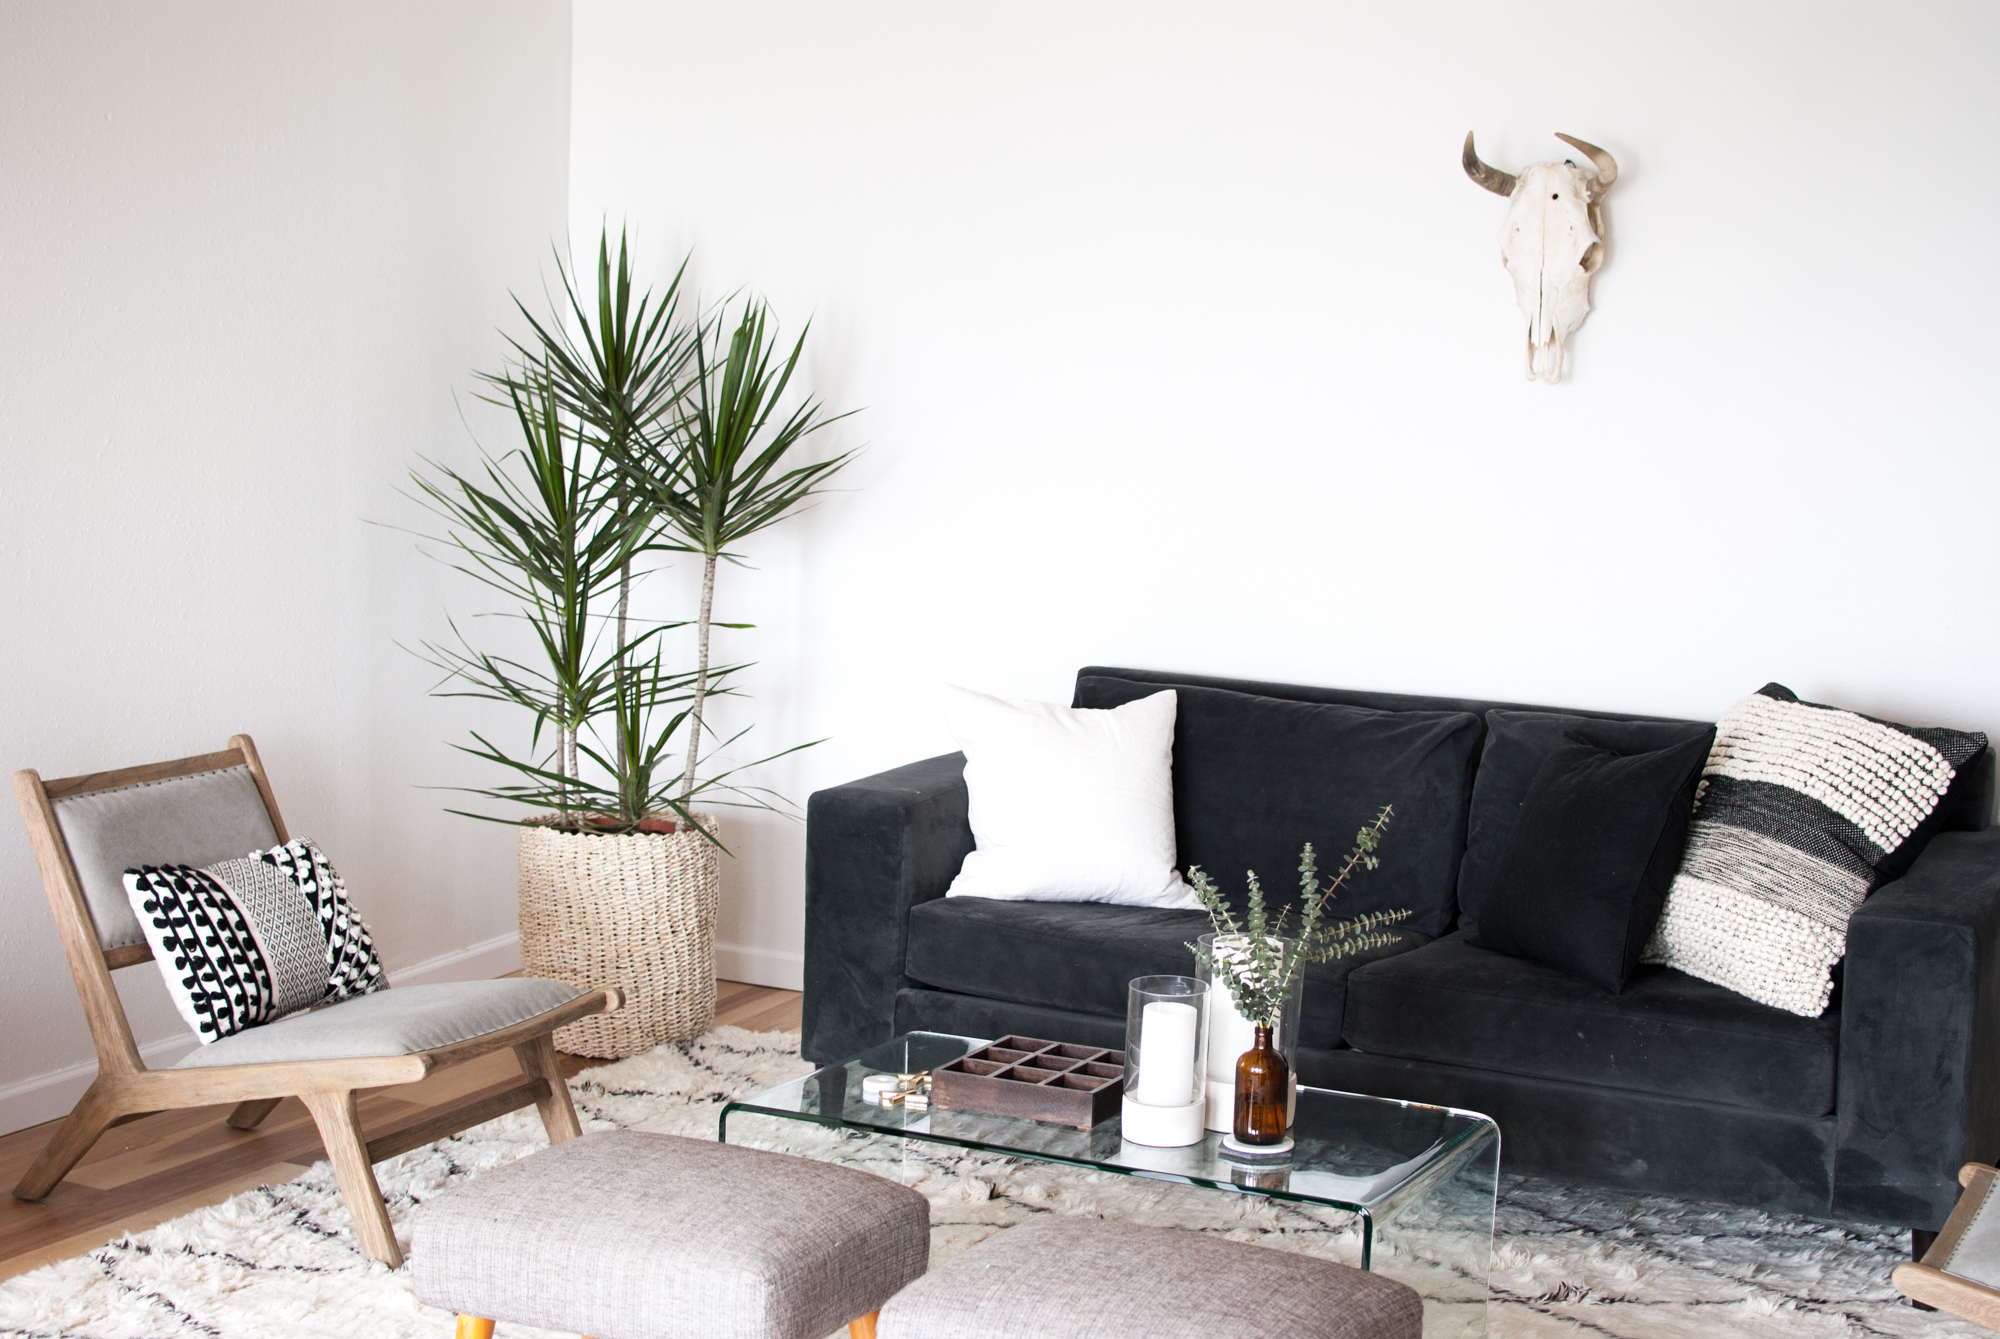 ClearCreekRetreat-airbnb-0320.jpg